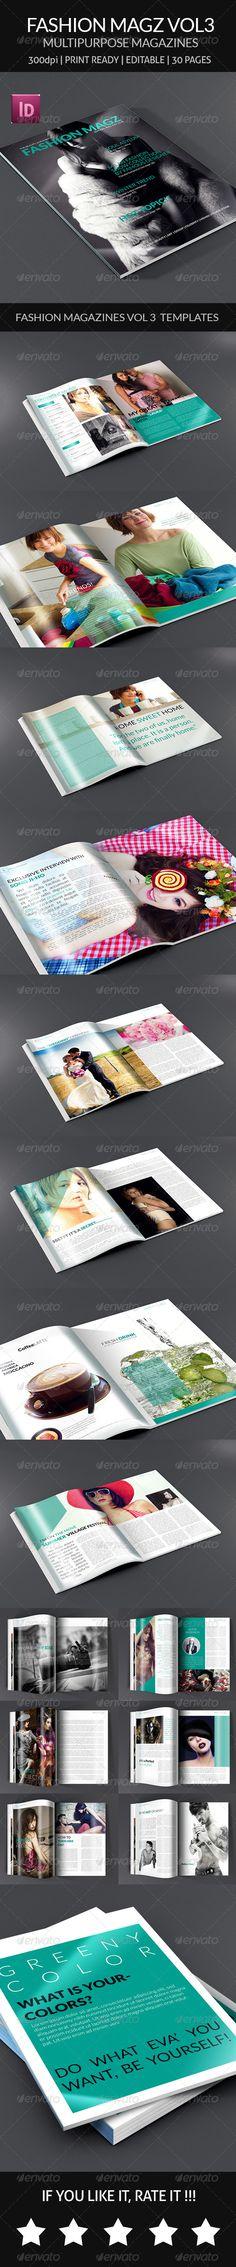 Fashion Magz Vol3 - Multipurpose Magazine Template - Magazines Print Templates Download here : https://graphicriver.net/item/fashion-magz-vol3-multipurpose-magazine-template/8160745?s_rank=99&ref=Al-fatih